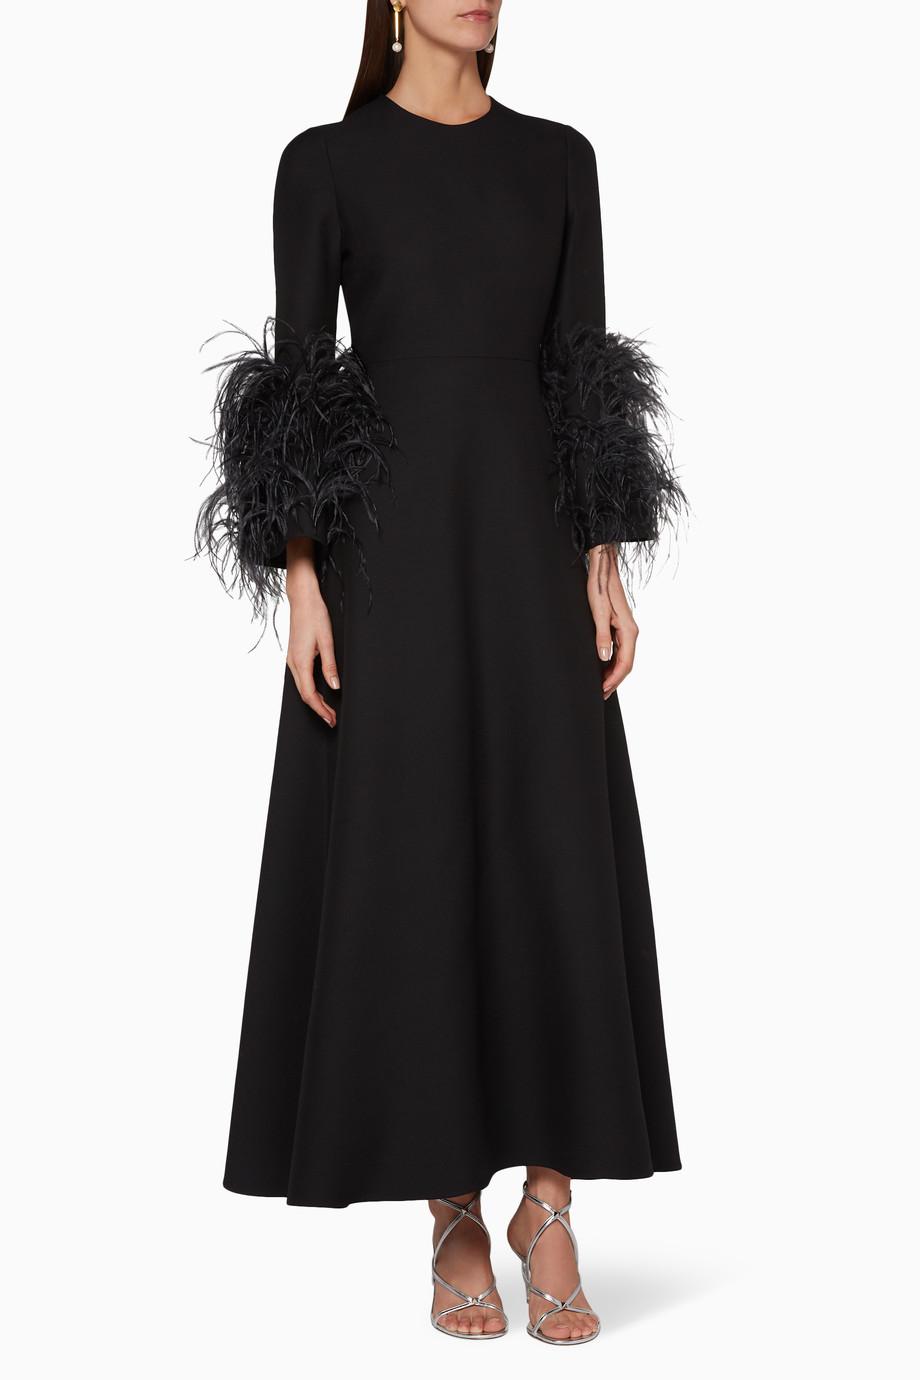 19bfd52d8 تسوق فستان طويل بأكمام مزينة بالريش Valentino أسود للنساء | اُناس ...